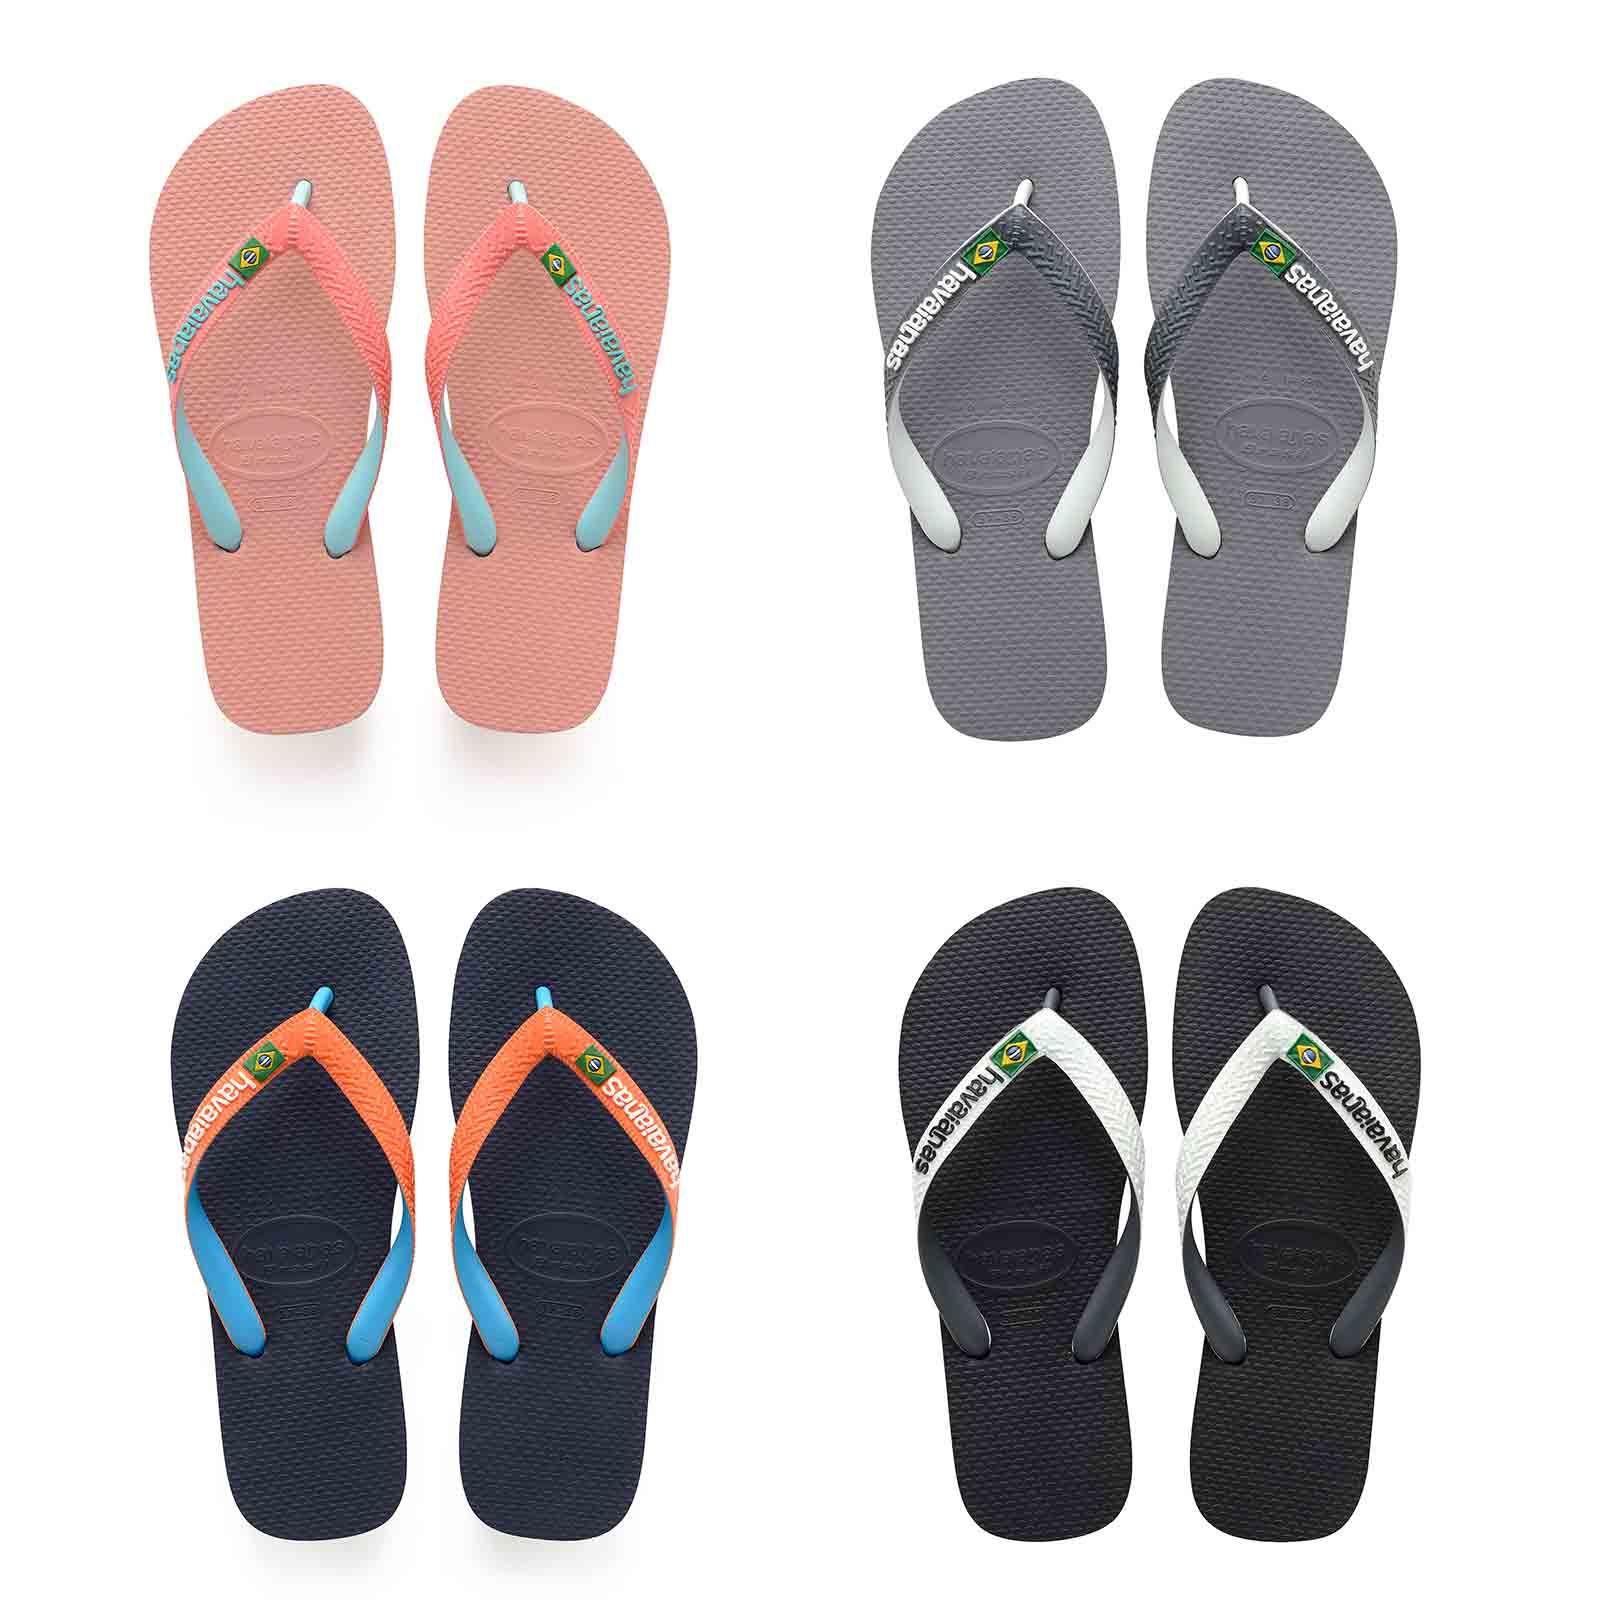 3faf9b0b3 Details about Havaianas Brasil Mix Flip Flops Summer Beach Thongs Sandals  Wide Range Colours